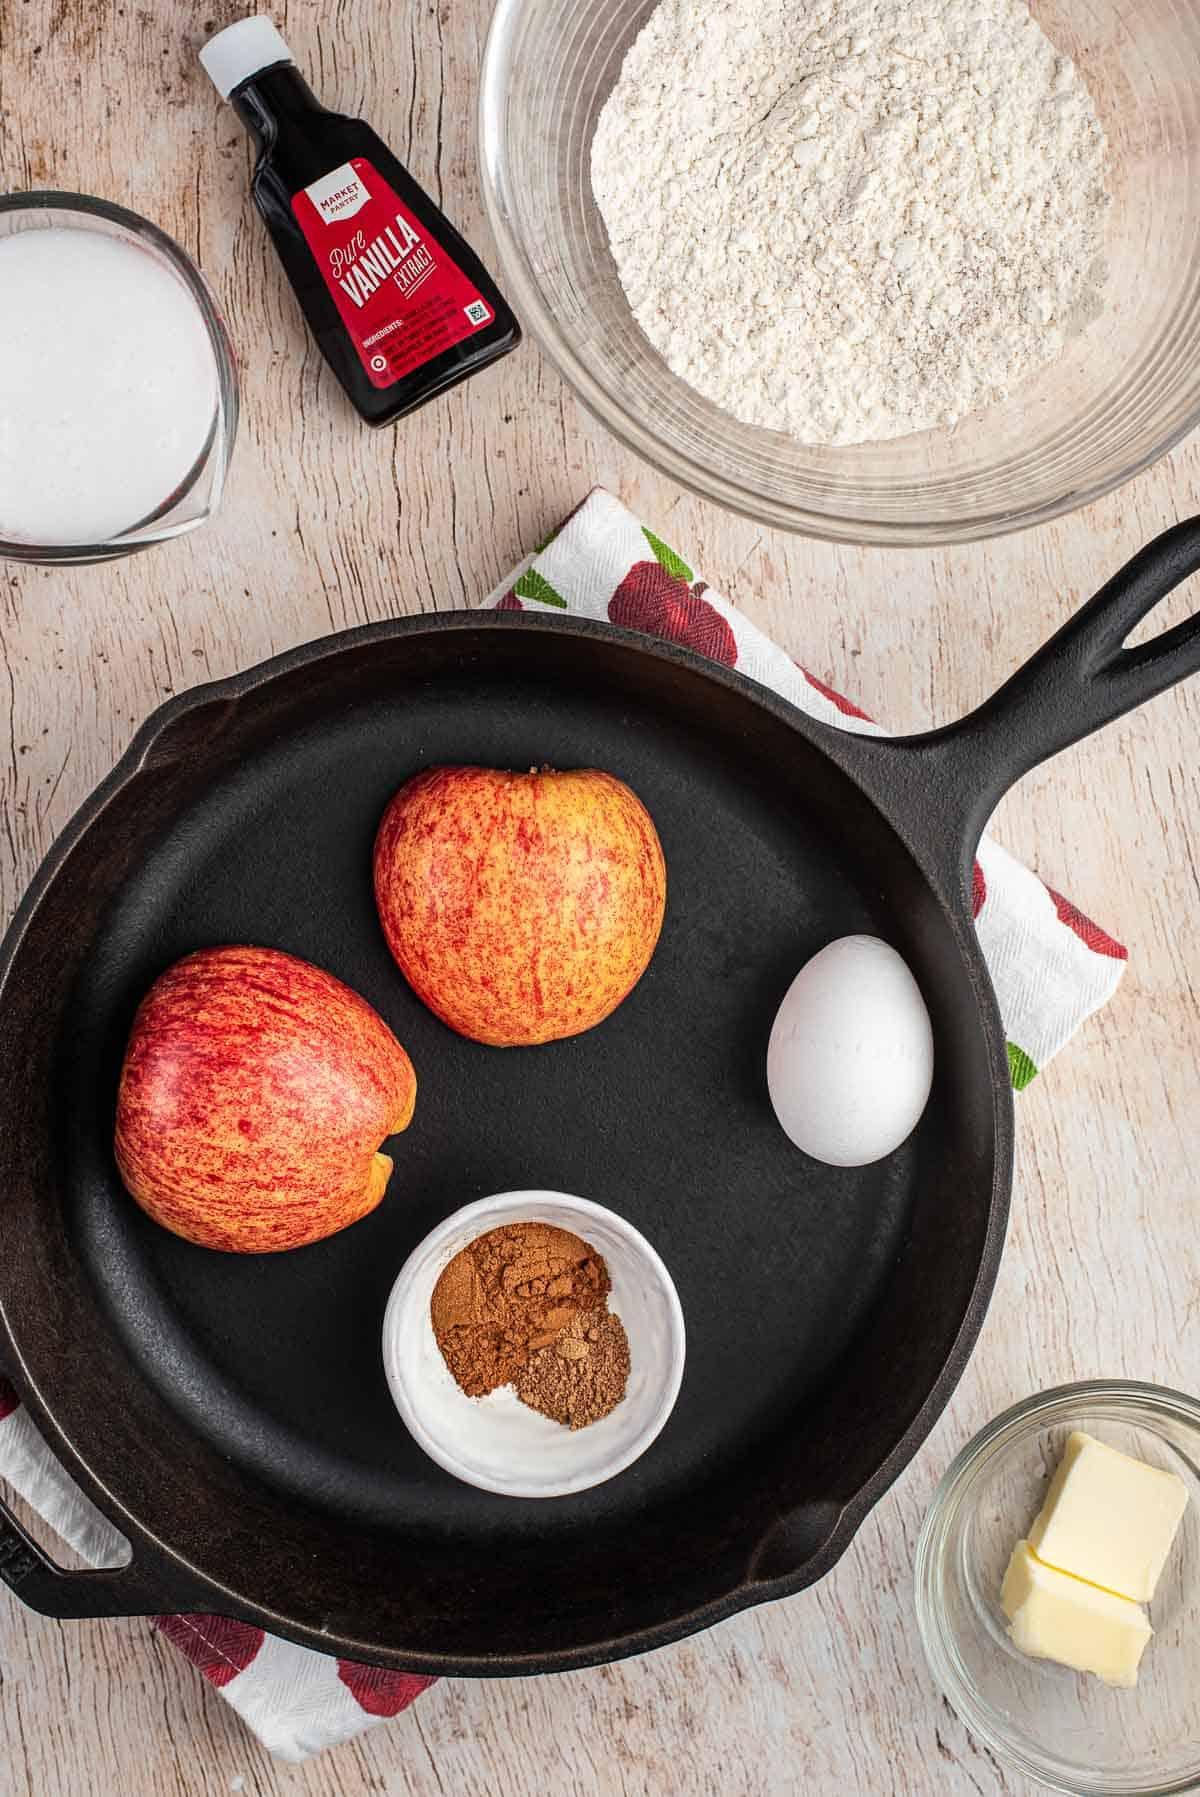 Apple pancake ingredients and a black skillet.